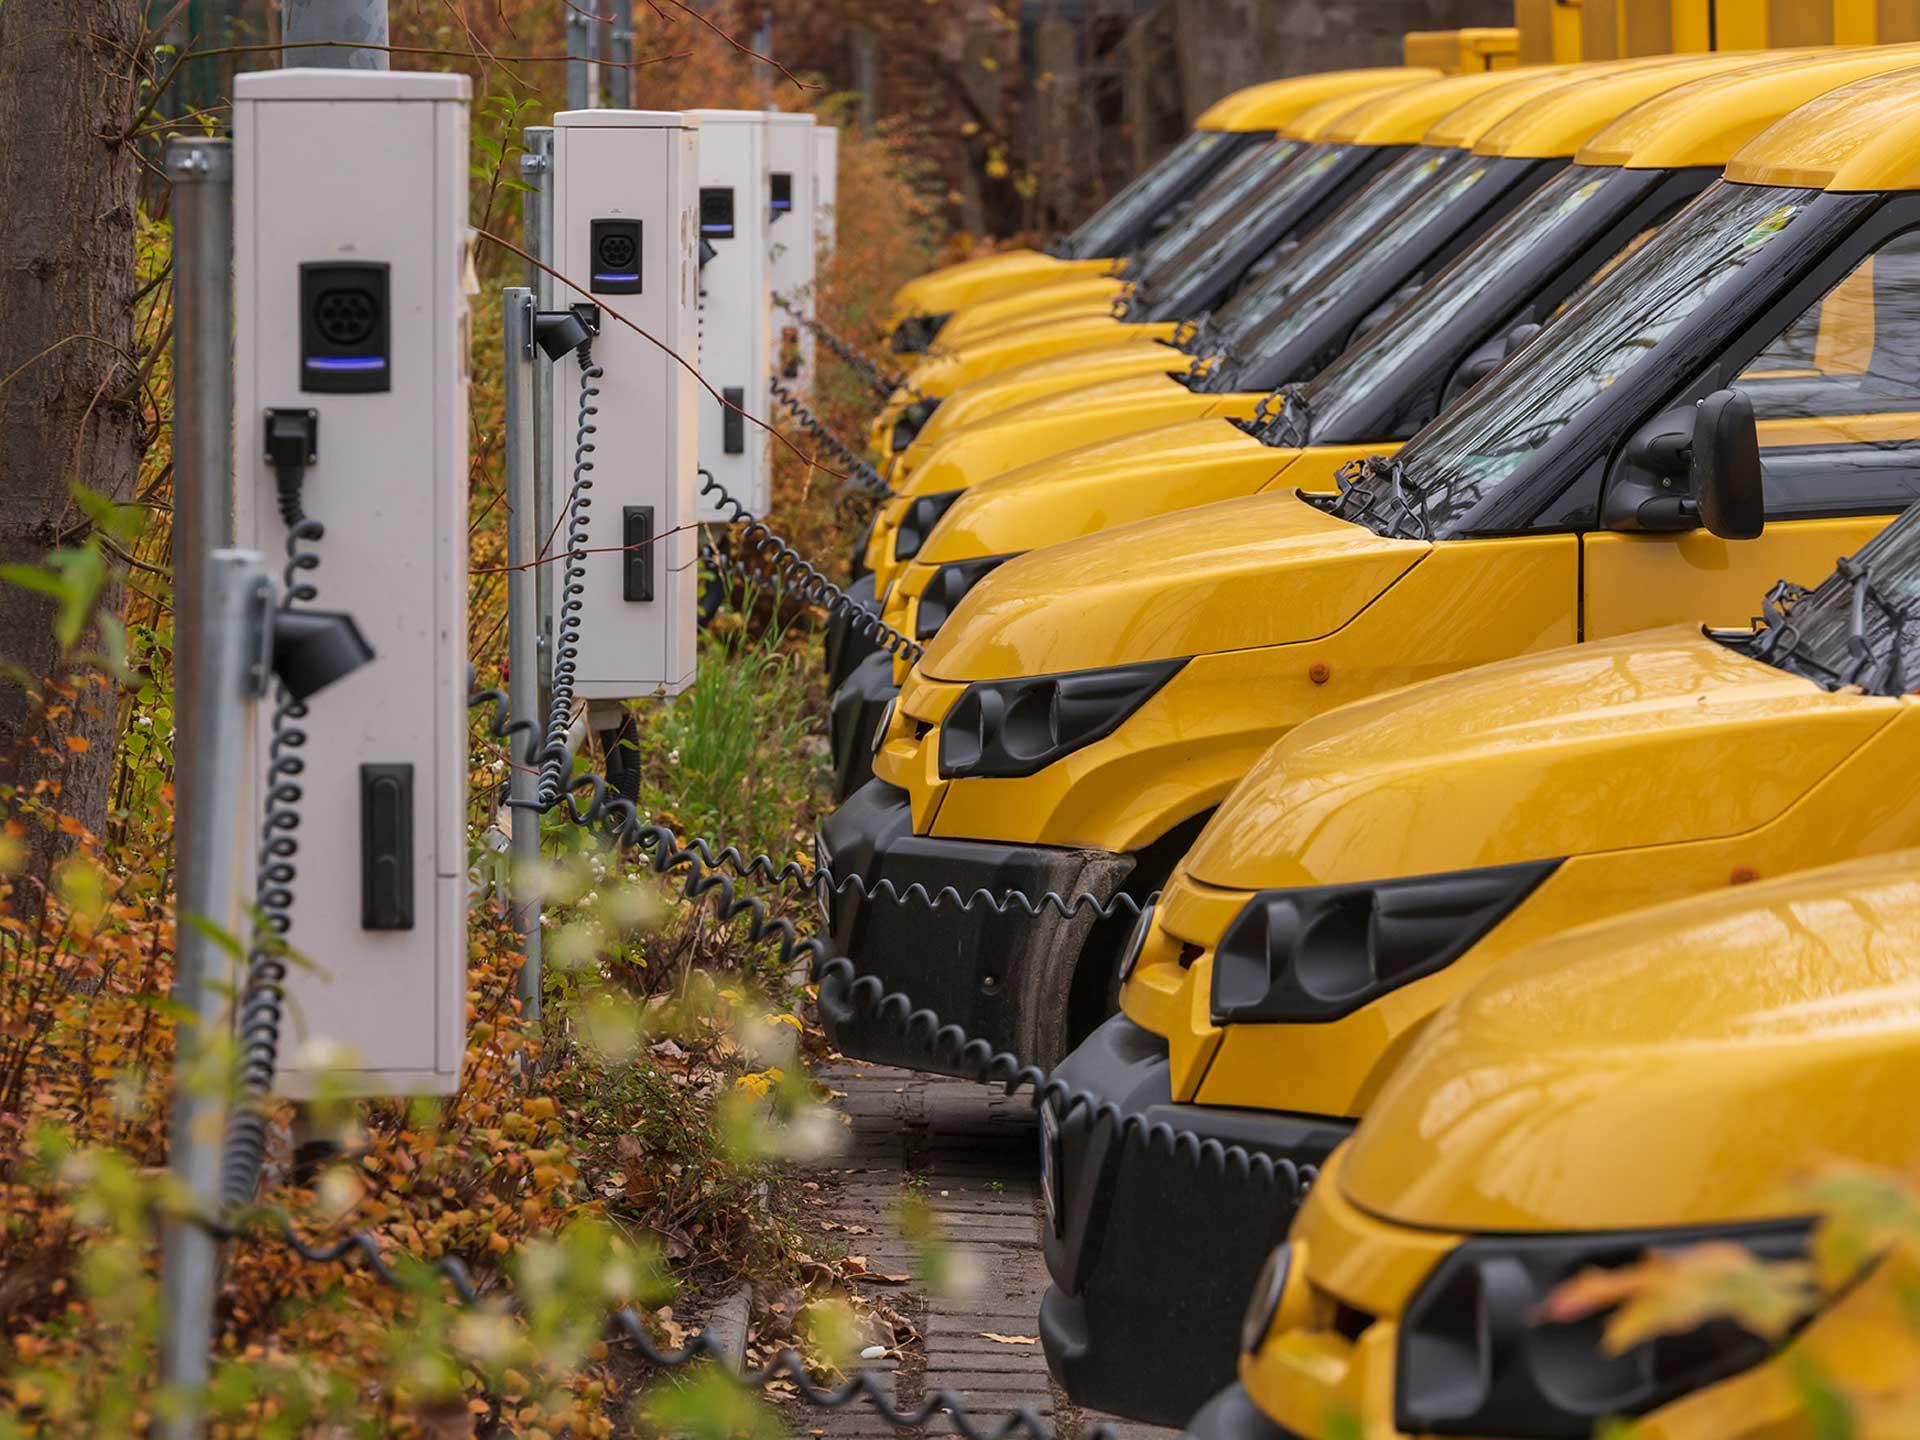 FedEx aims to be carbon neutral by 2040, pledges $2 billion